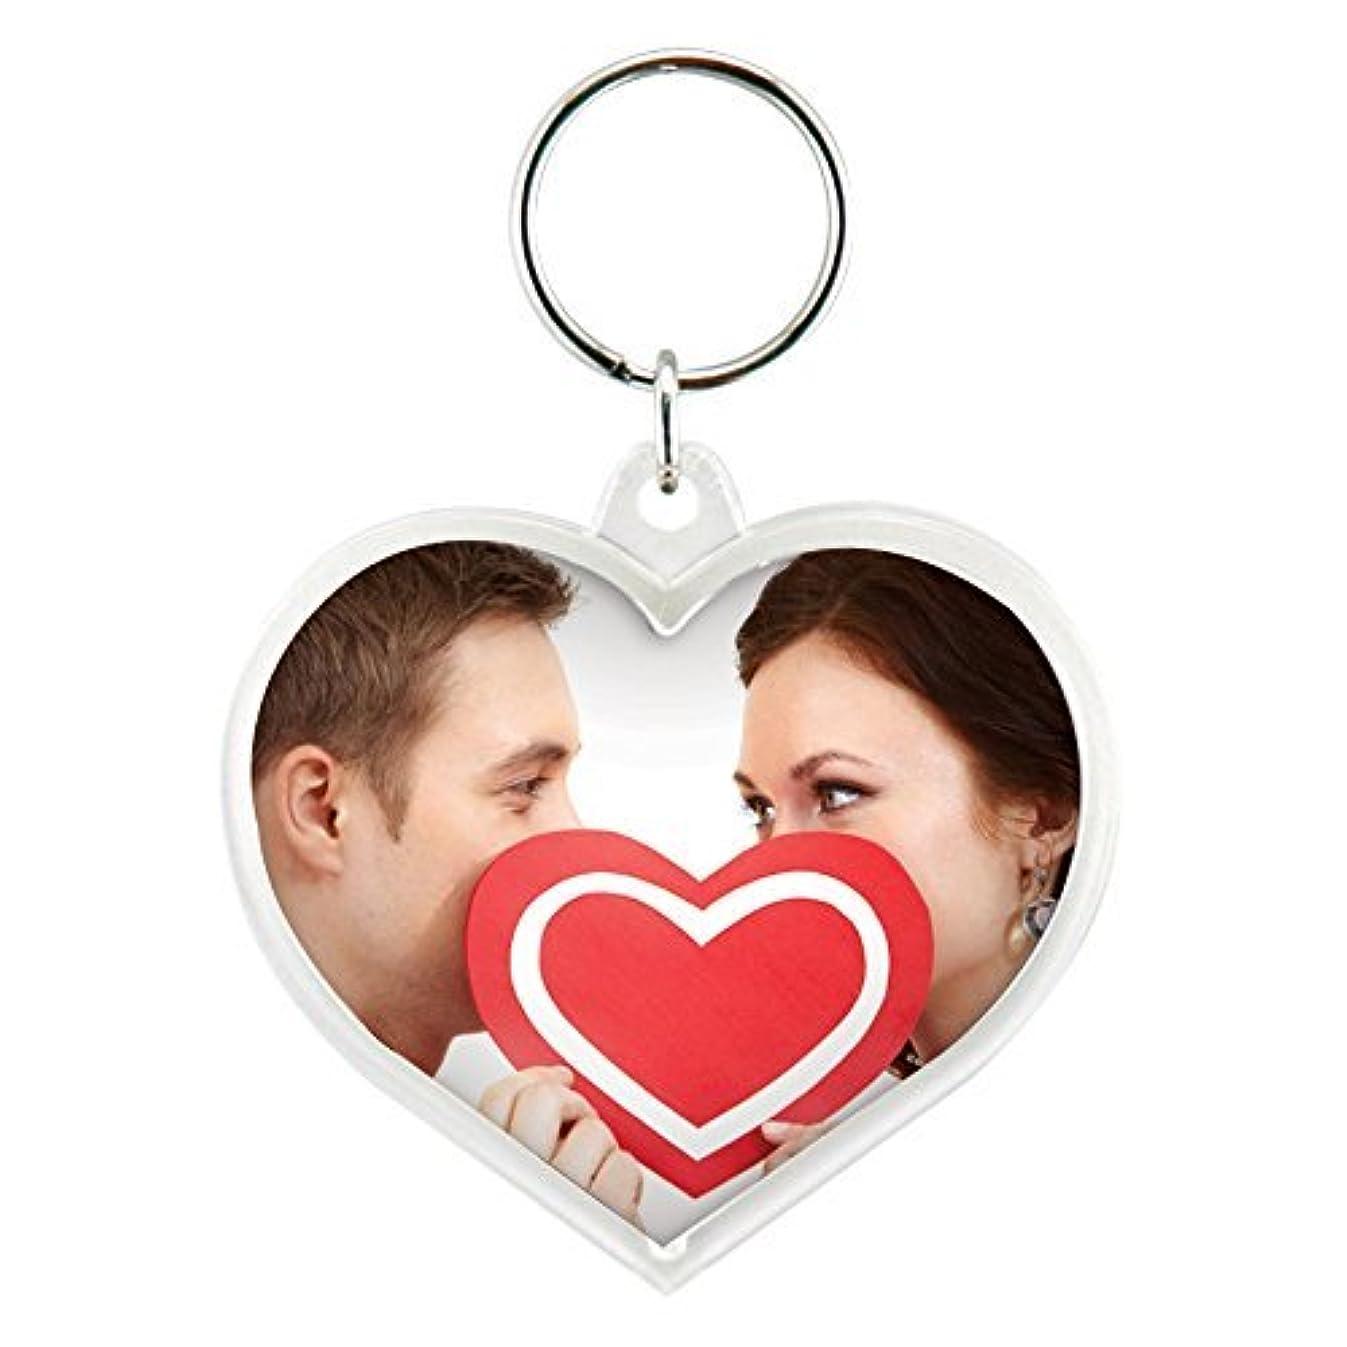 Heart Acrylic Snap-In Photo Keychain (1)